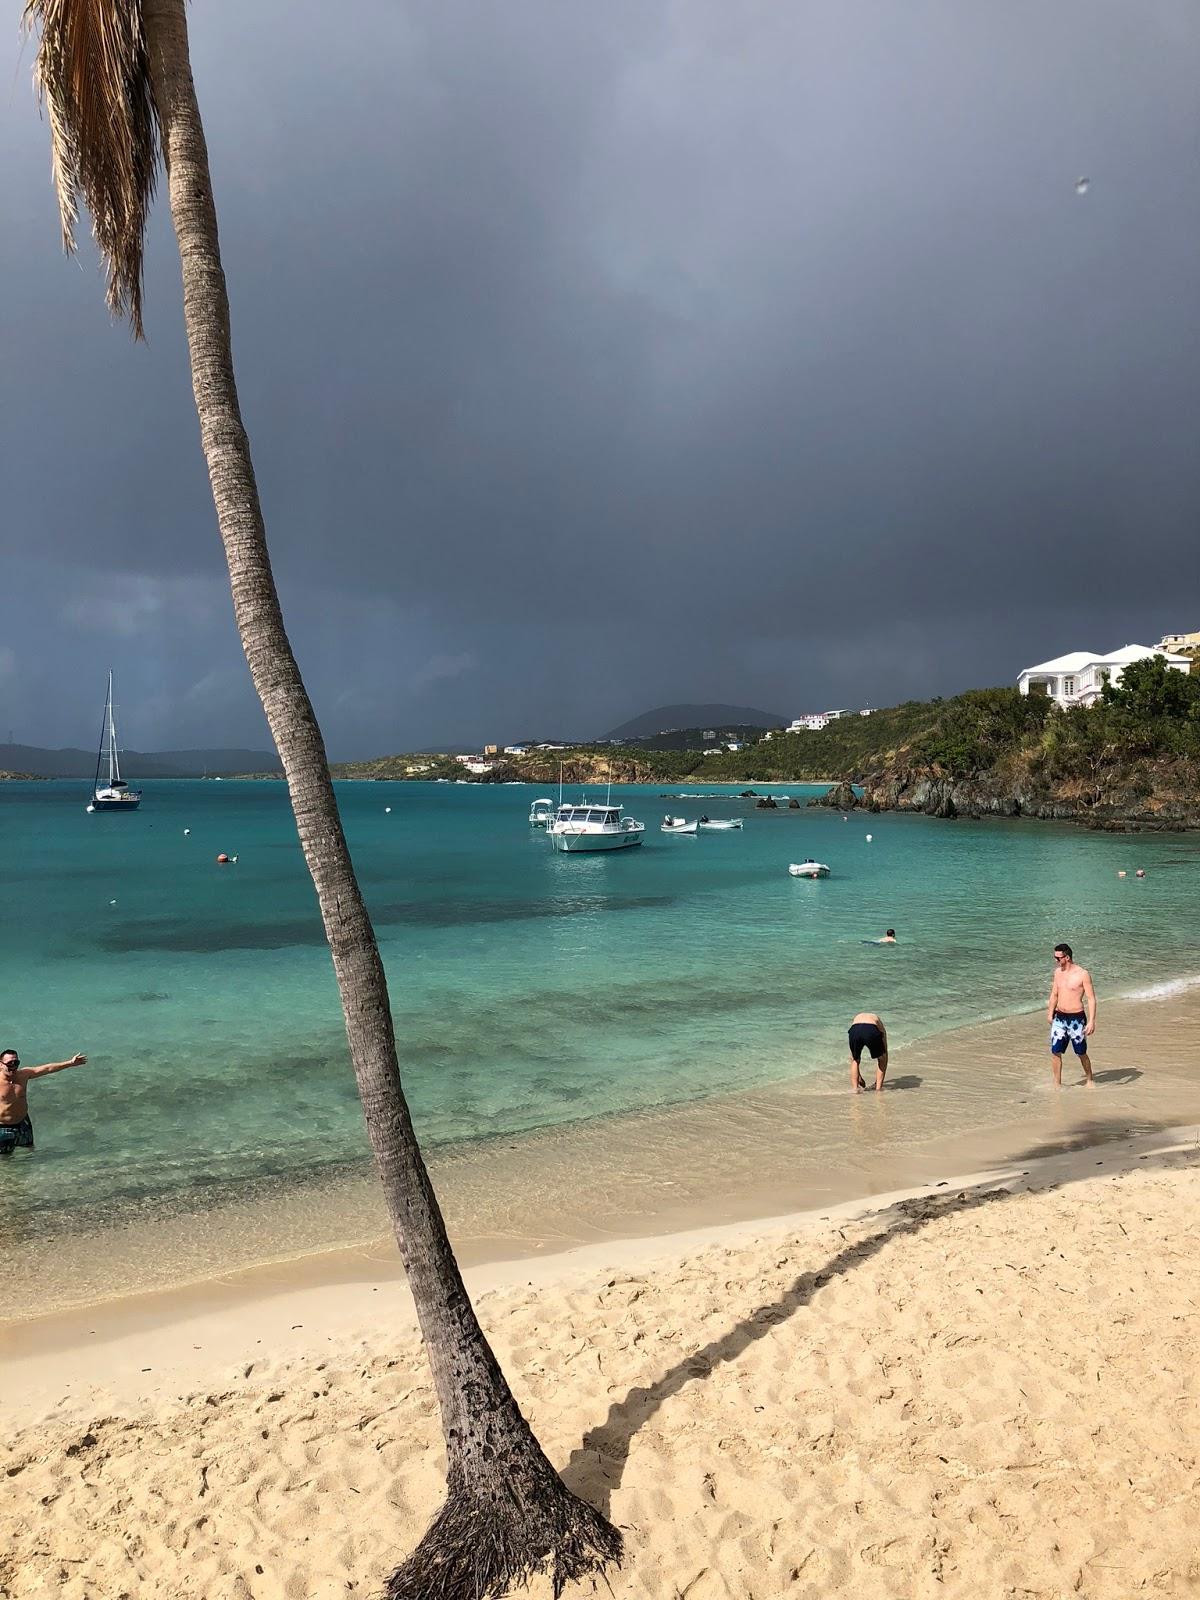 #Vlog2 Cruzeiro no Caribe: desembarque na primeira ilha: St. Thomas